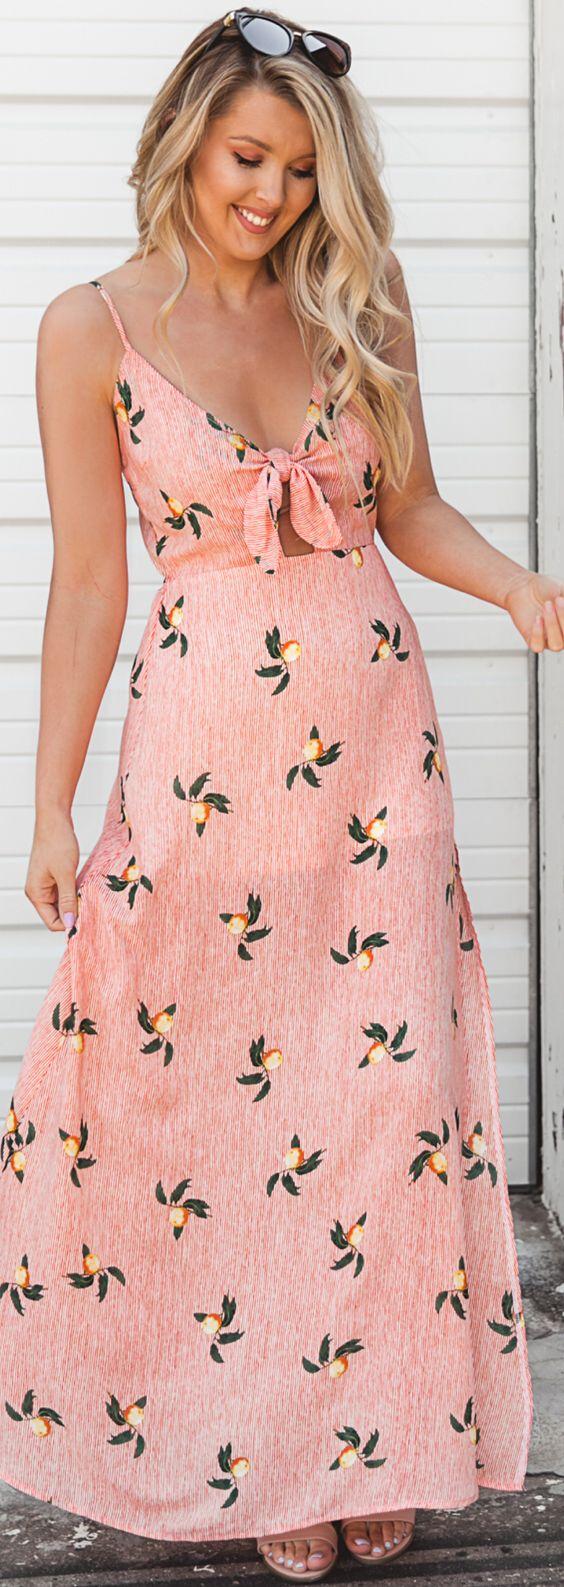 Adorable Peach Summer Dress